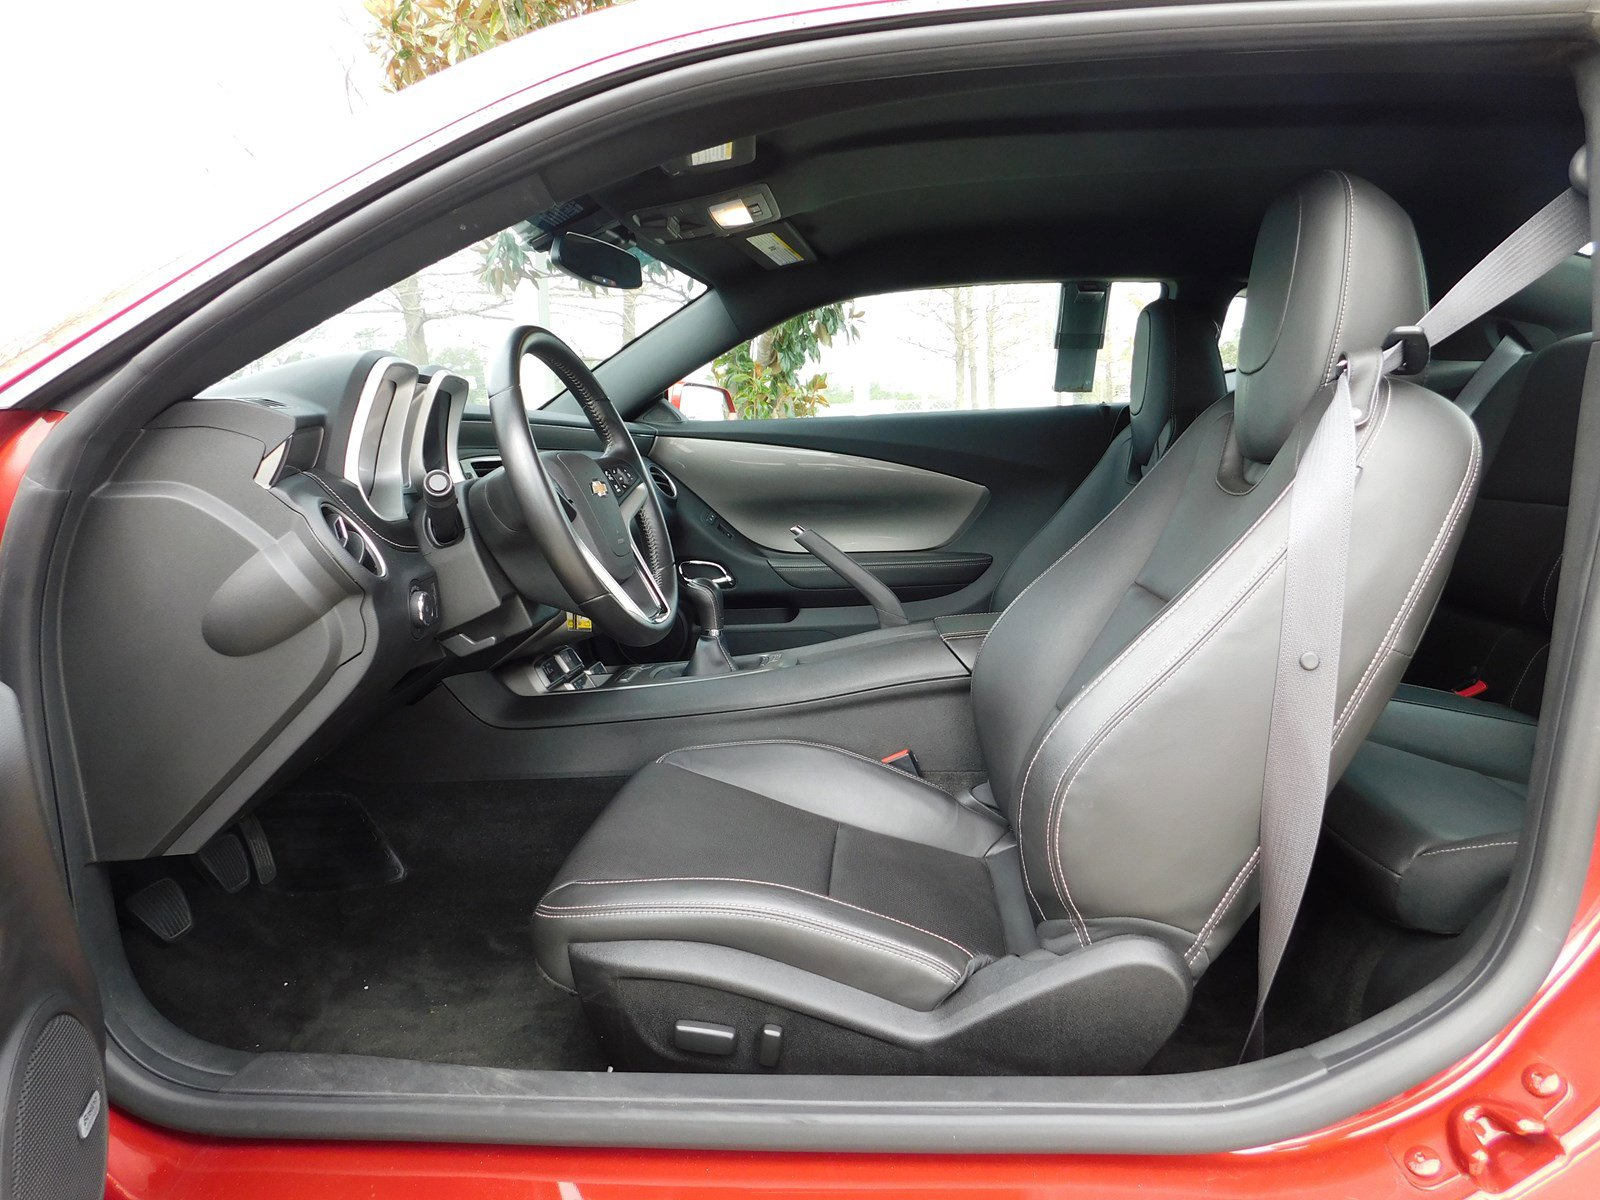 Pre-Owned 2015 Chevrolet Camaro LT